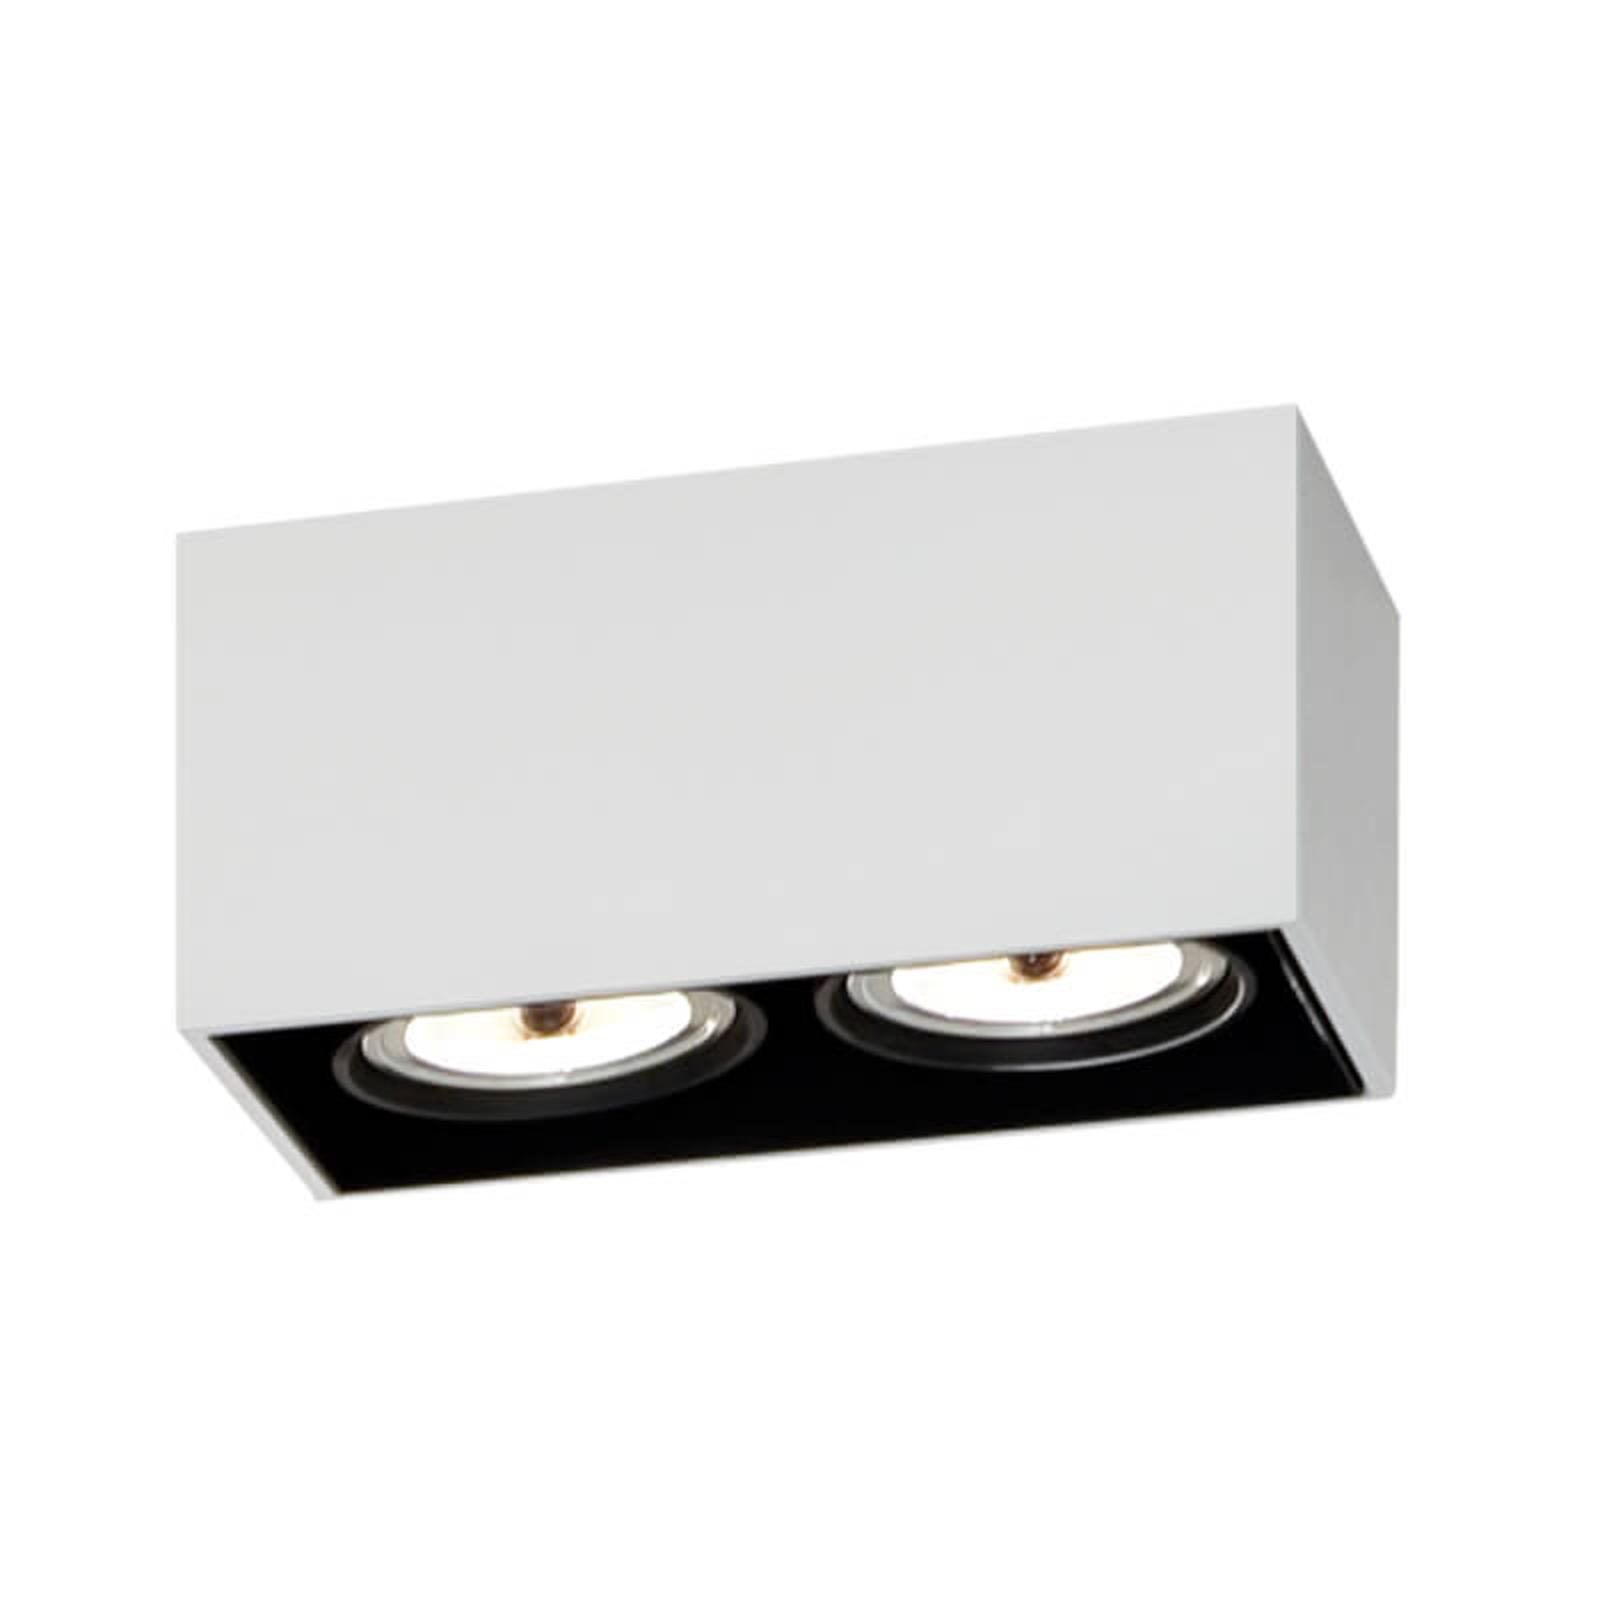 Hvit Compass Box taklampe med to lys